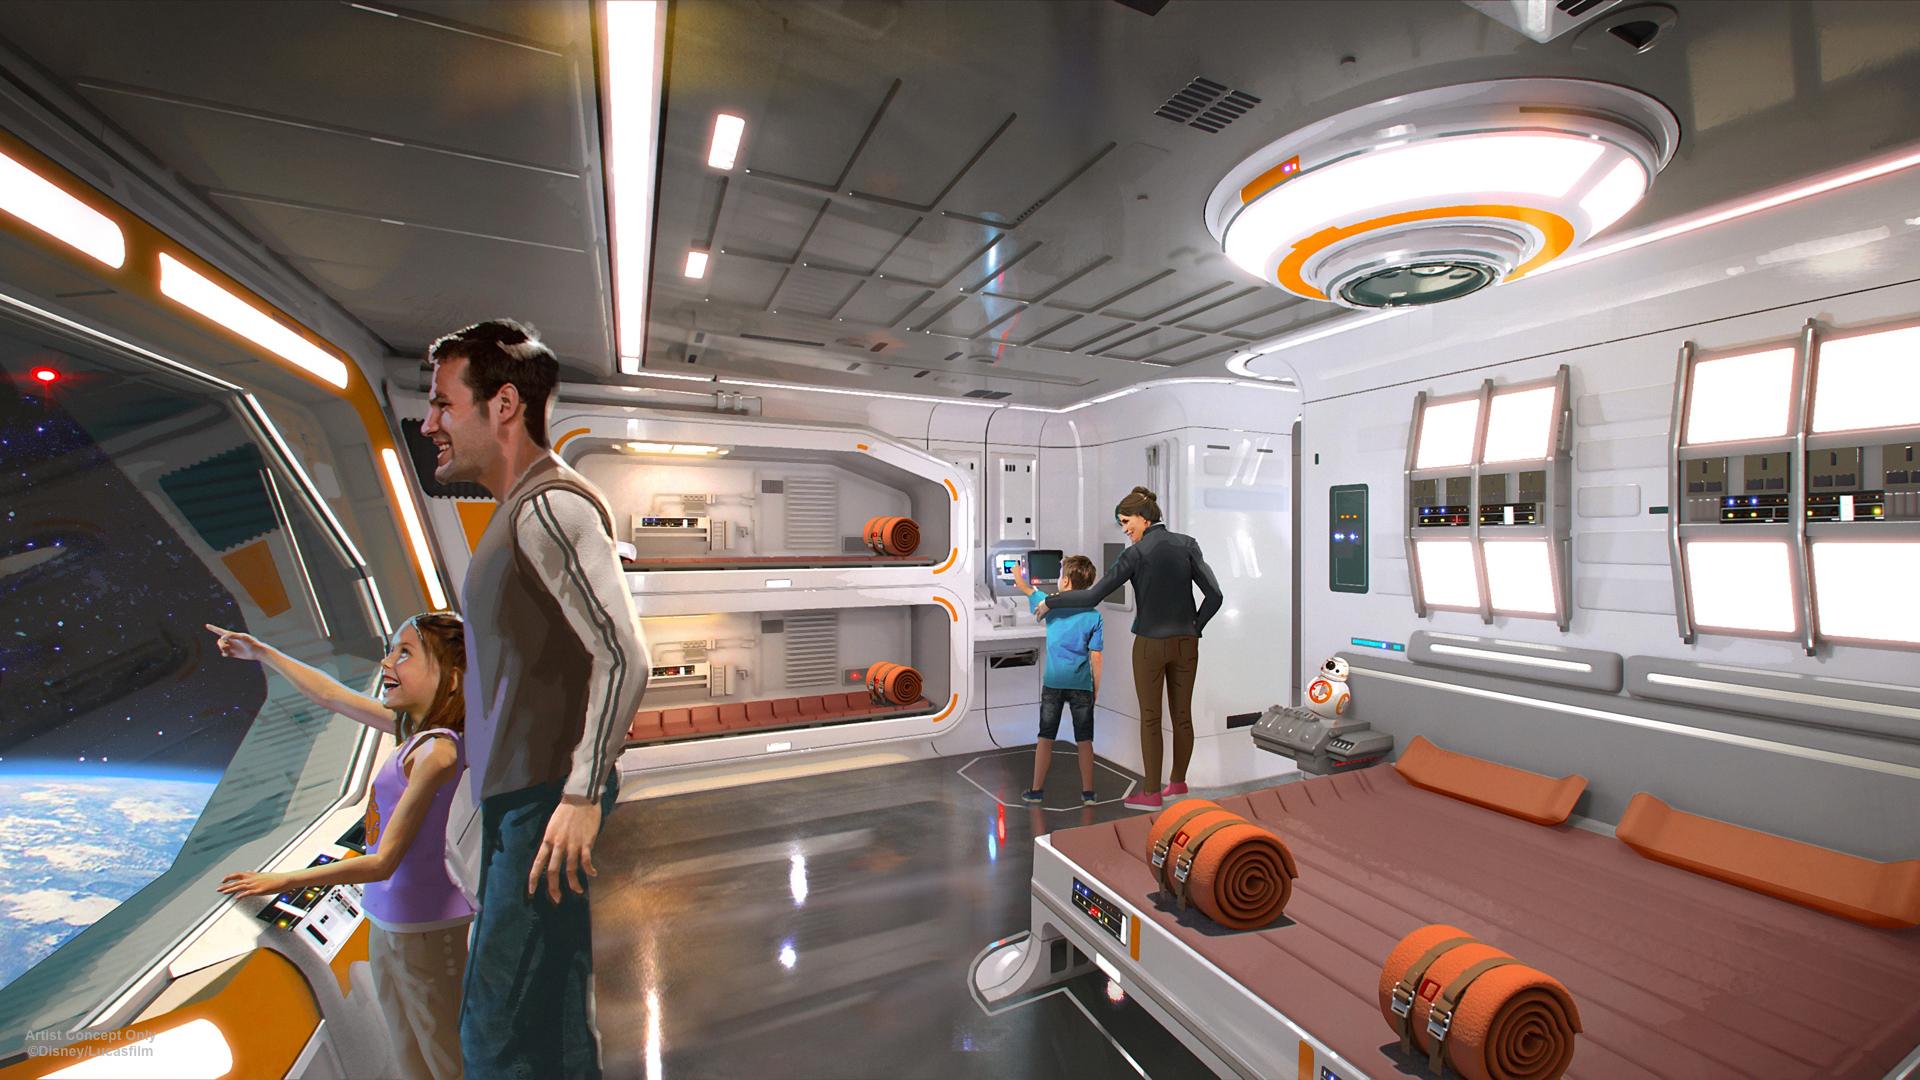 Disney's Star Wars Resort at Walt Disney World